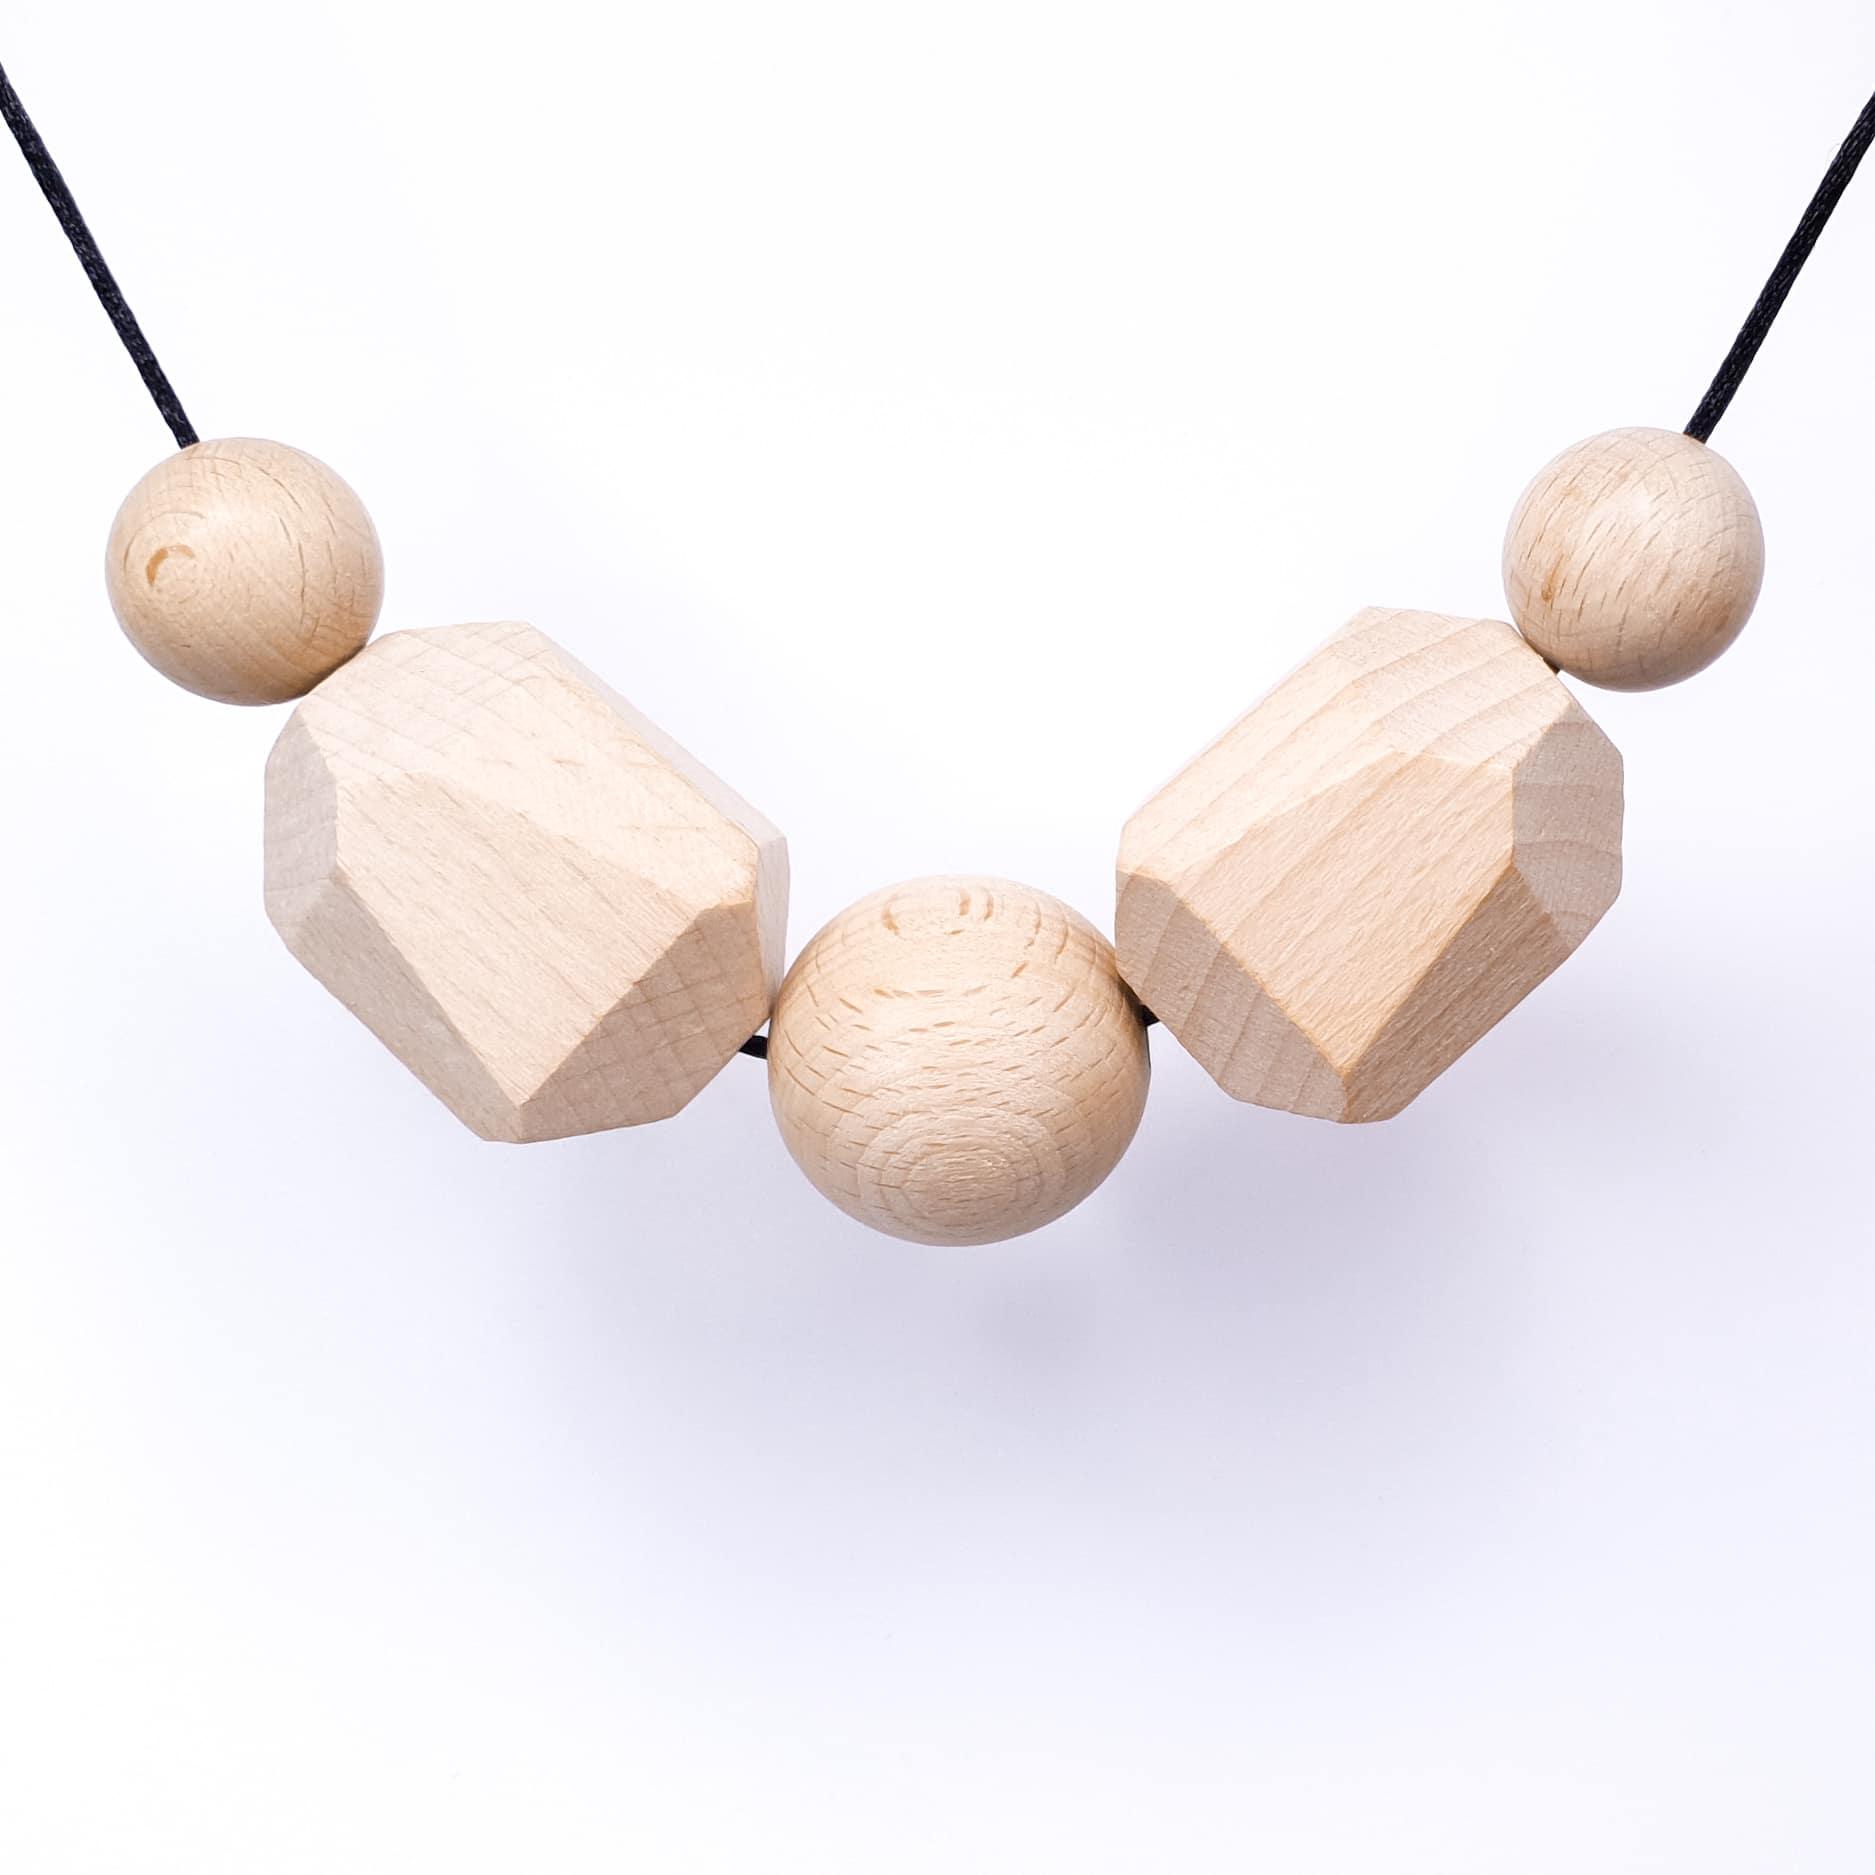 Beuken hout rotsblok borstvoedingsketting